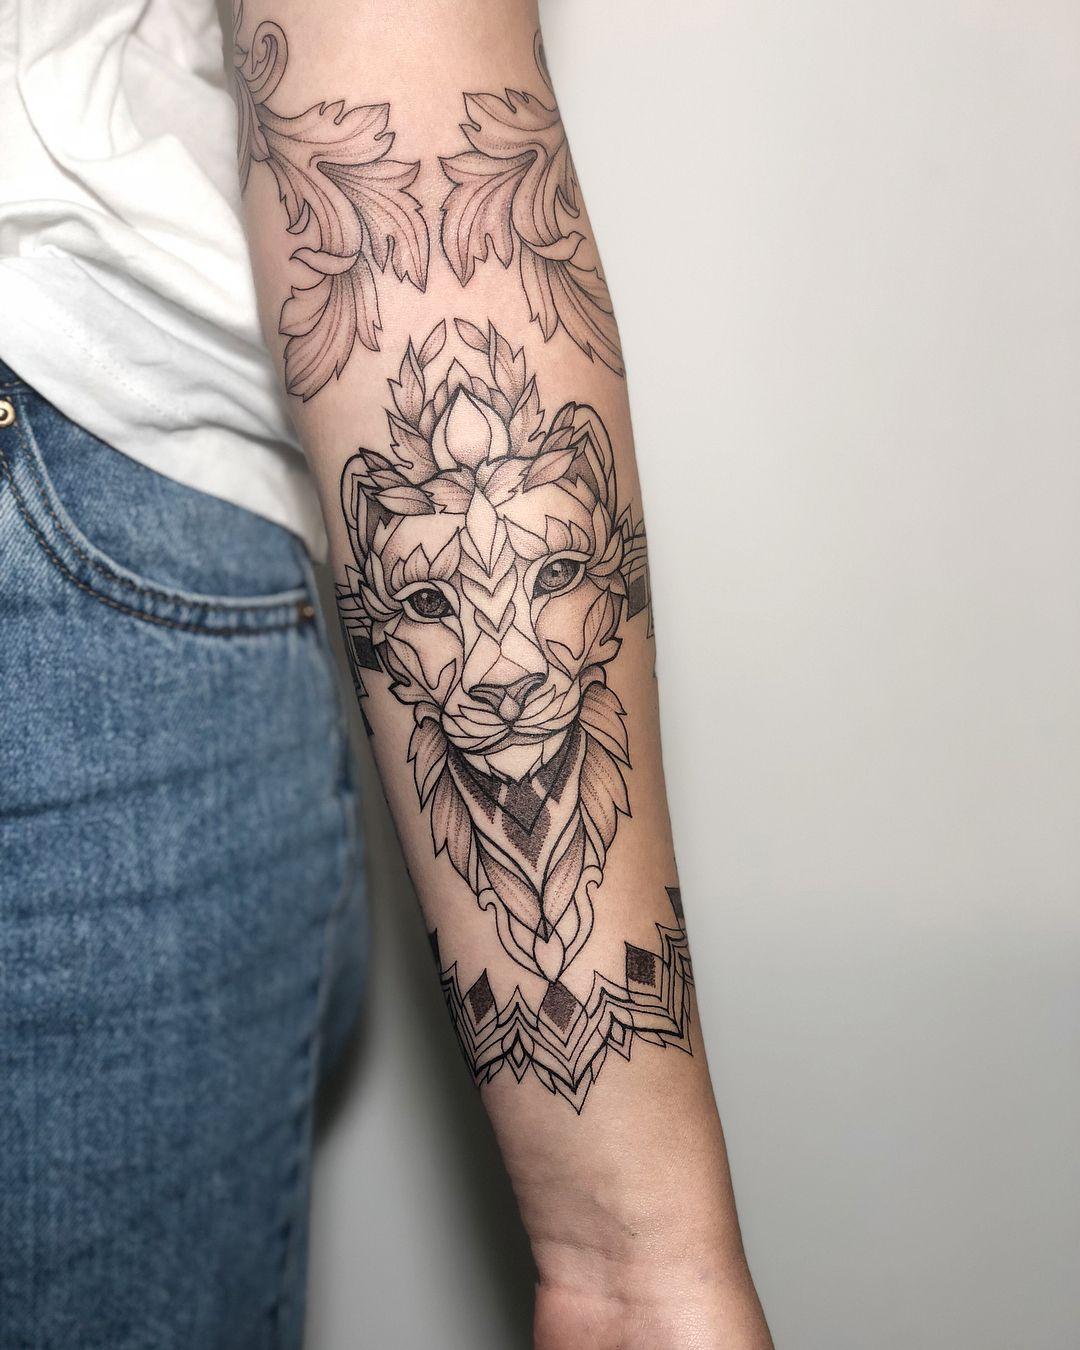 Irainkers Tattoo Linework Dotwork Wipshading Animaltattoo Cattattoo Tatowierungen Tattoo Ideen Ideen